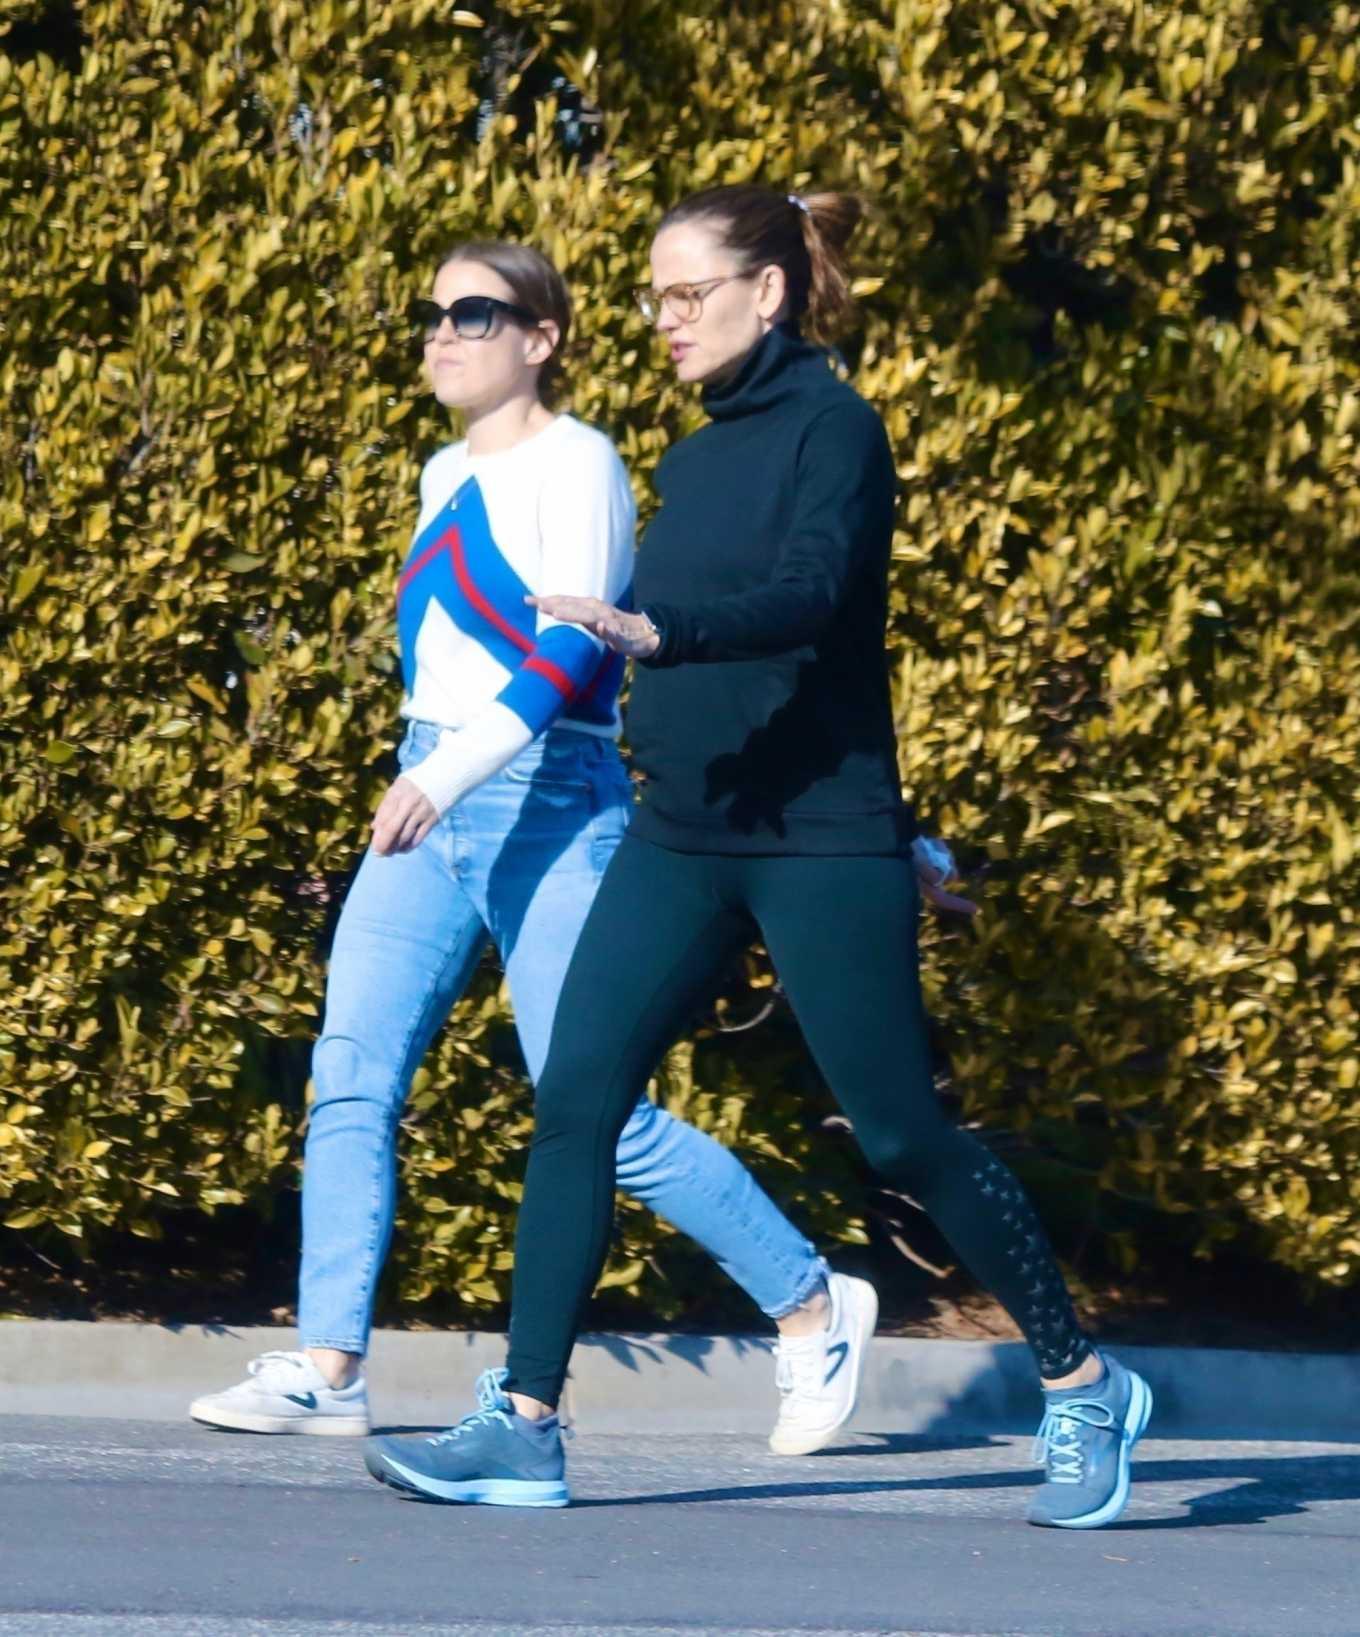 Jennifer Garner 2020 : Jennifer Garner with a friend out for a power walk session in Pacific Palisades-05